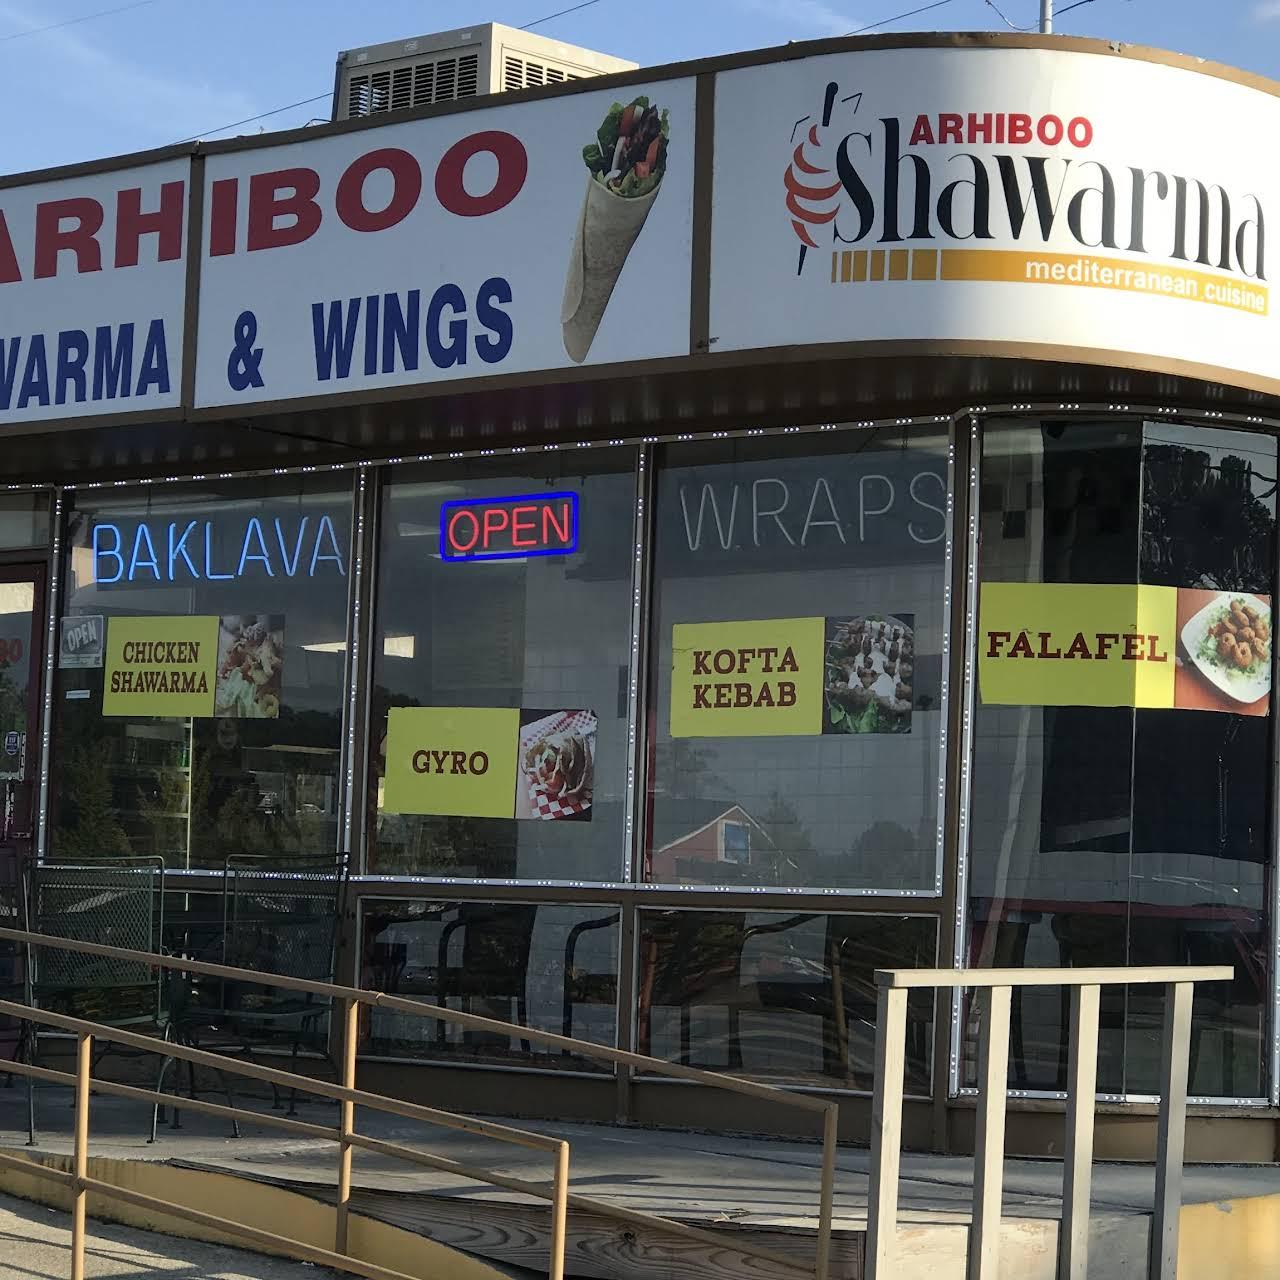 Arhiboo Shawarma - Mediterranean Restaurant in Stone Mountain